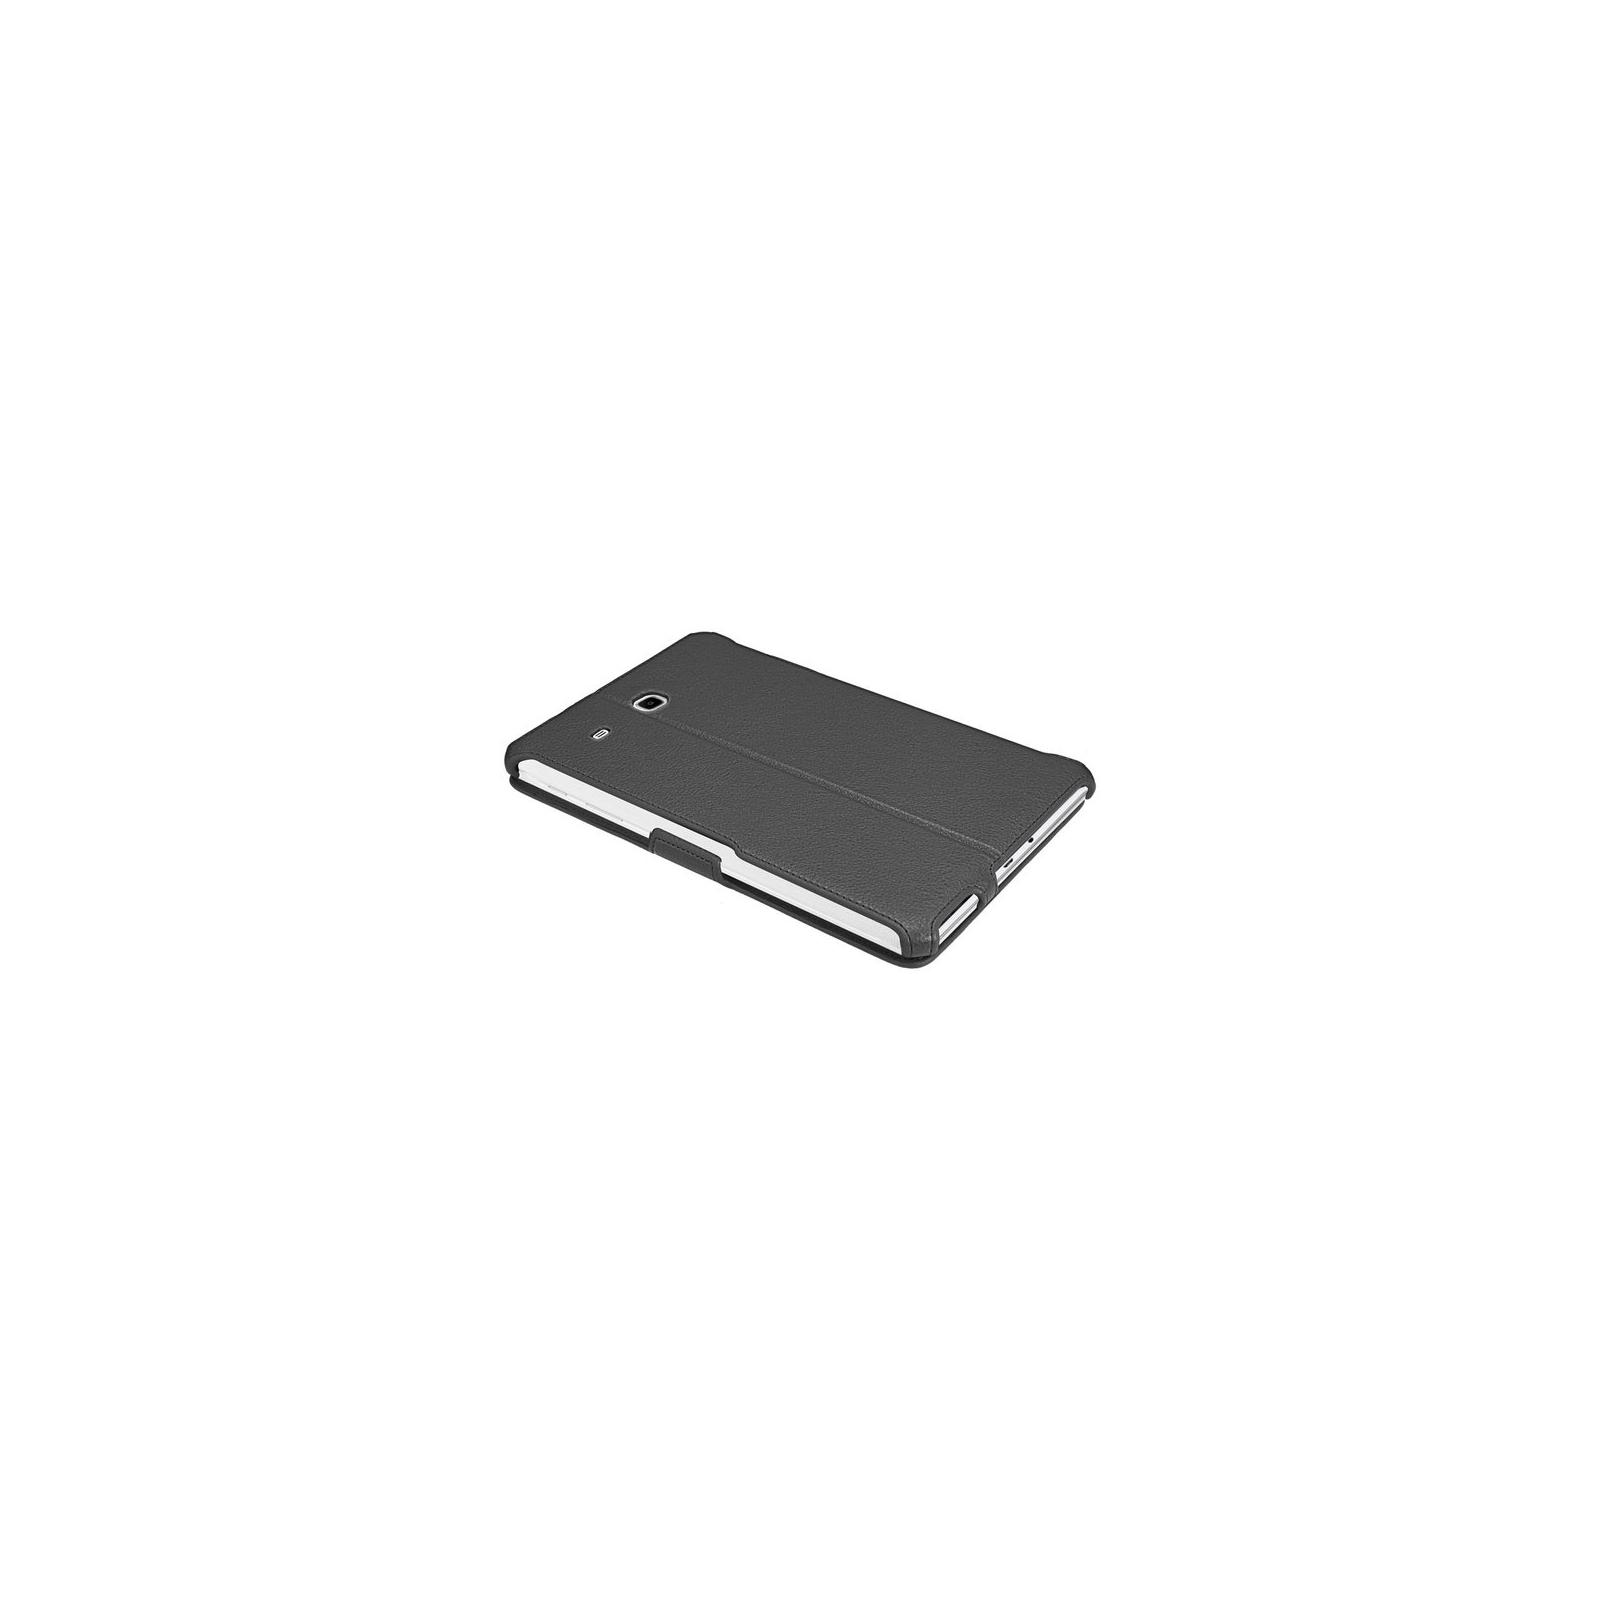 Чехол для планшета AirOn для Samsung Galaxy Tab E 9.6 black (4822352779559) изображение 4